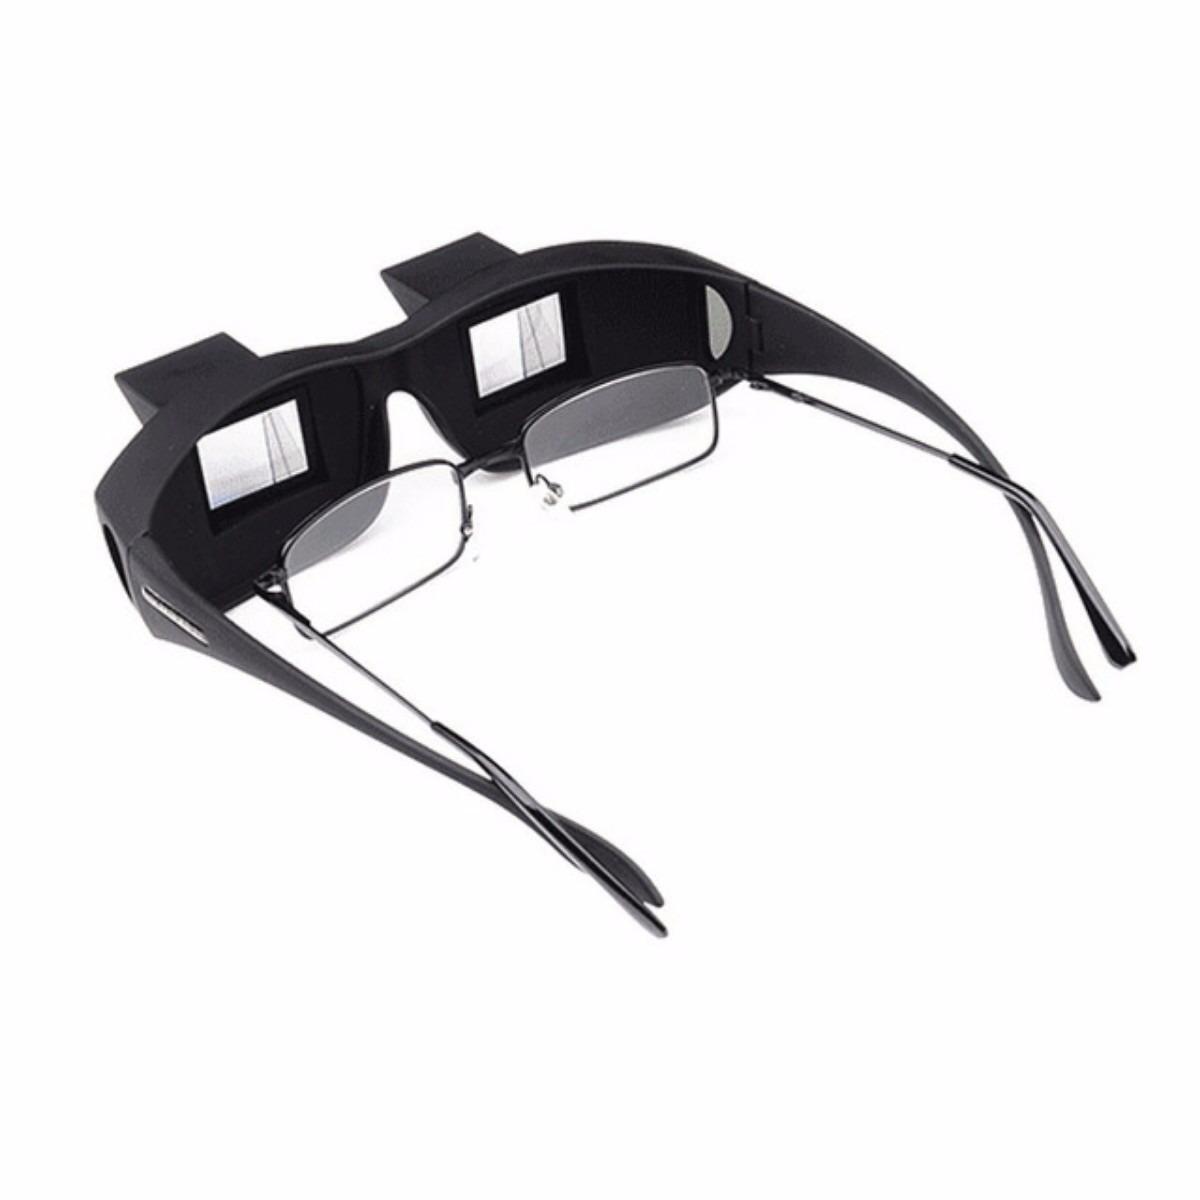 fa900138c8 Anteojos Lentes Para Leer Acostado-lazy Glasses - $ 278,68 en ...